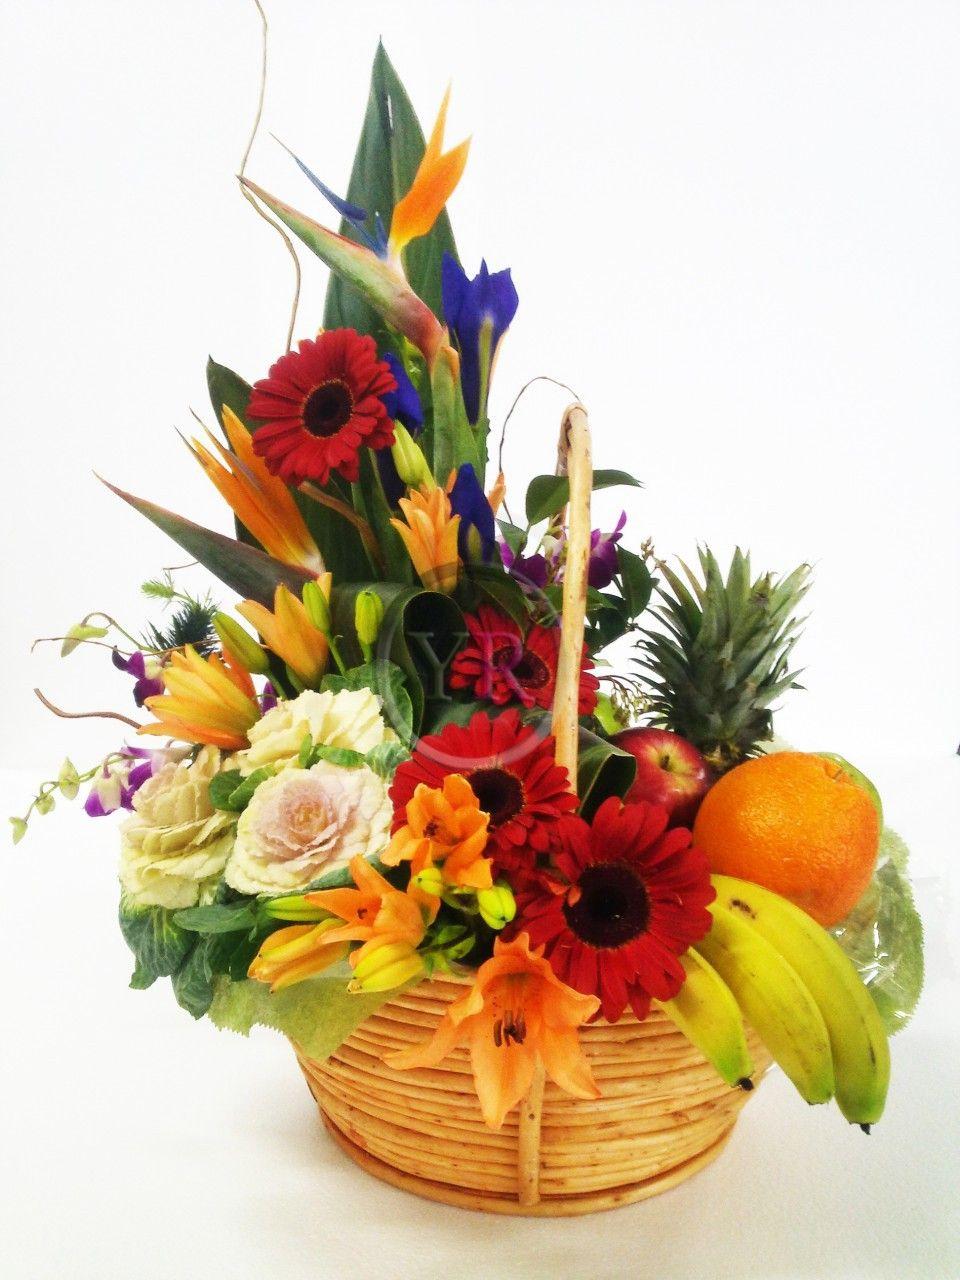 Summer Sun Fun And Tons Of Surprises Visit Www Flowersdeliveryhouston Com And Enjoy Summer Flowers Floral Baskets Flower Arrangements Fruit Flower Basket